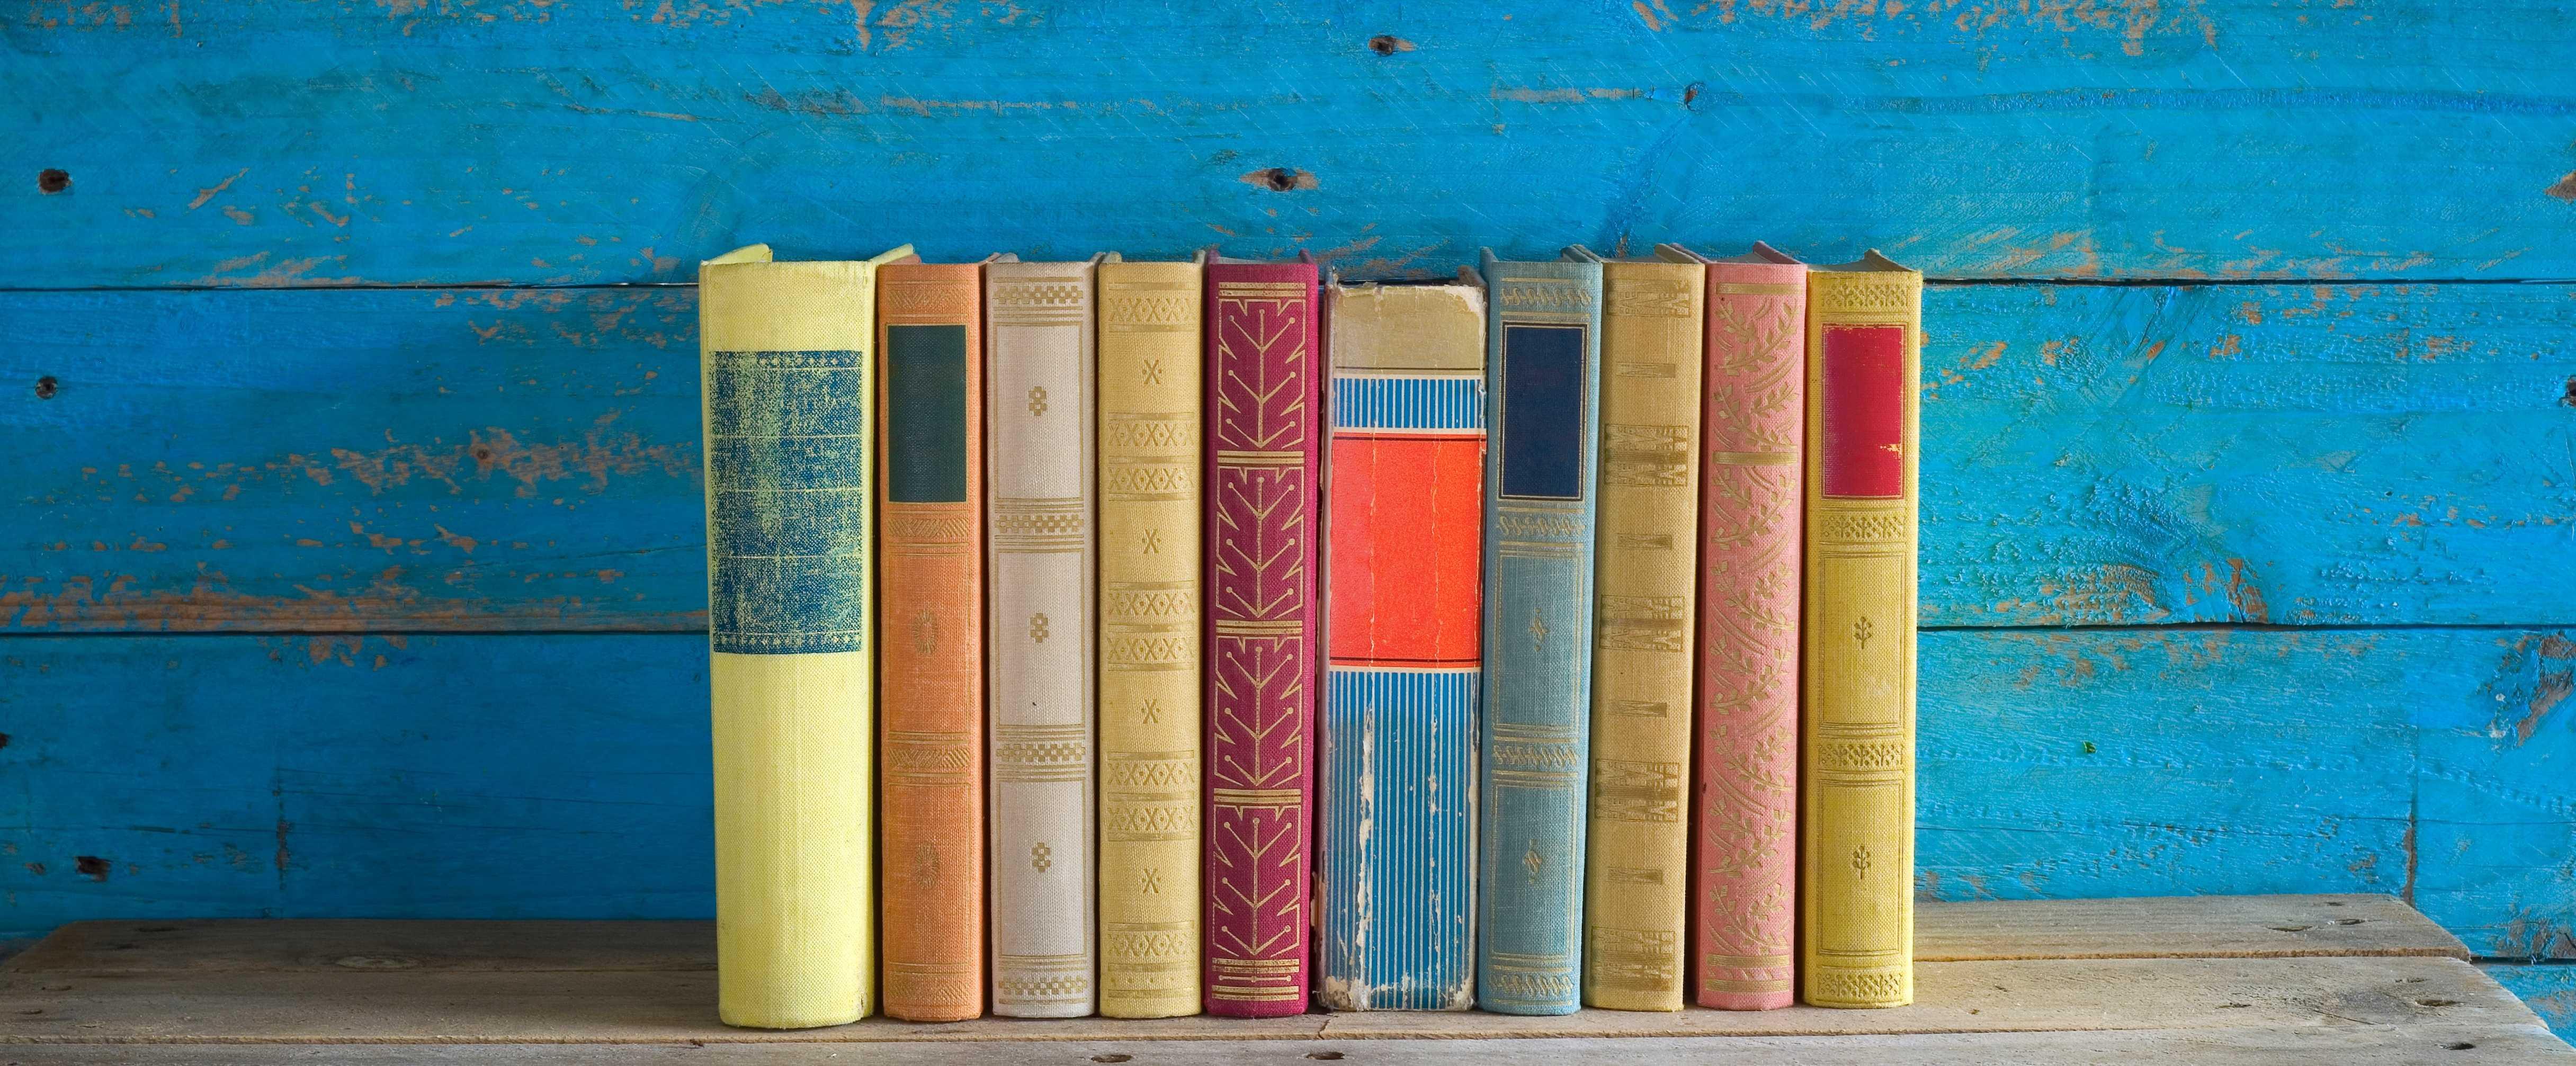 ceo-favorite-books.jpg